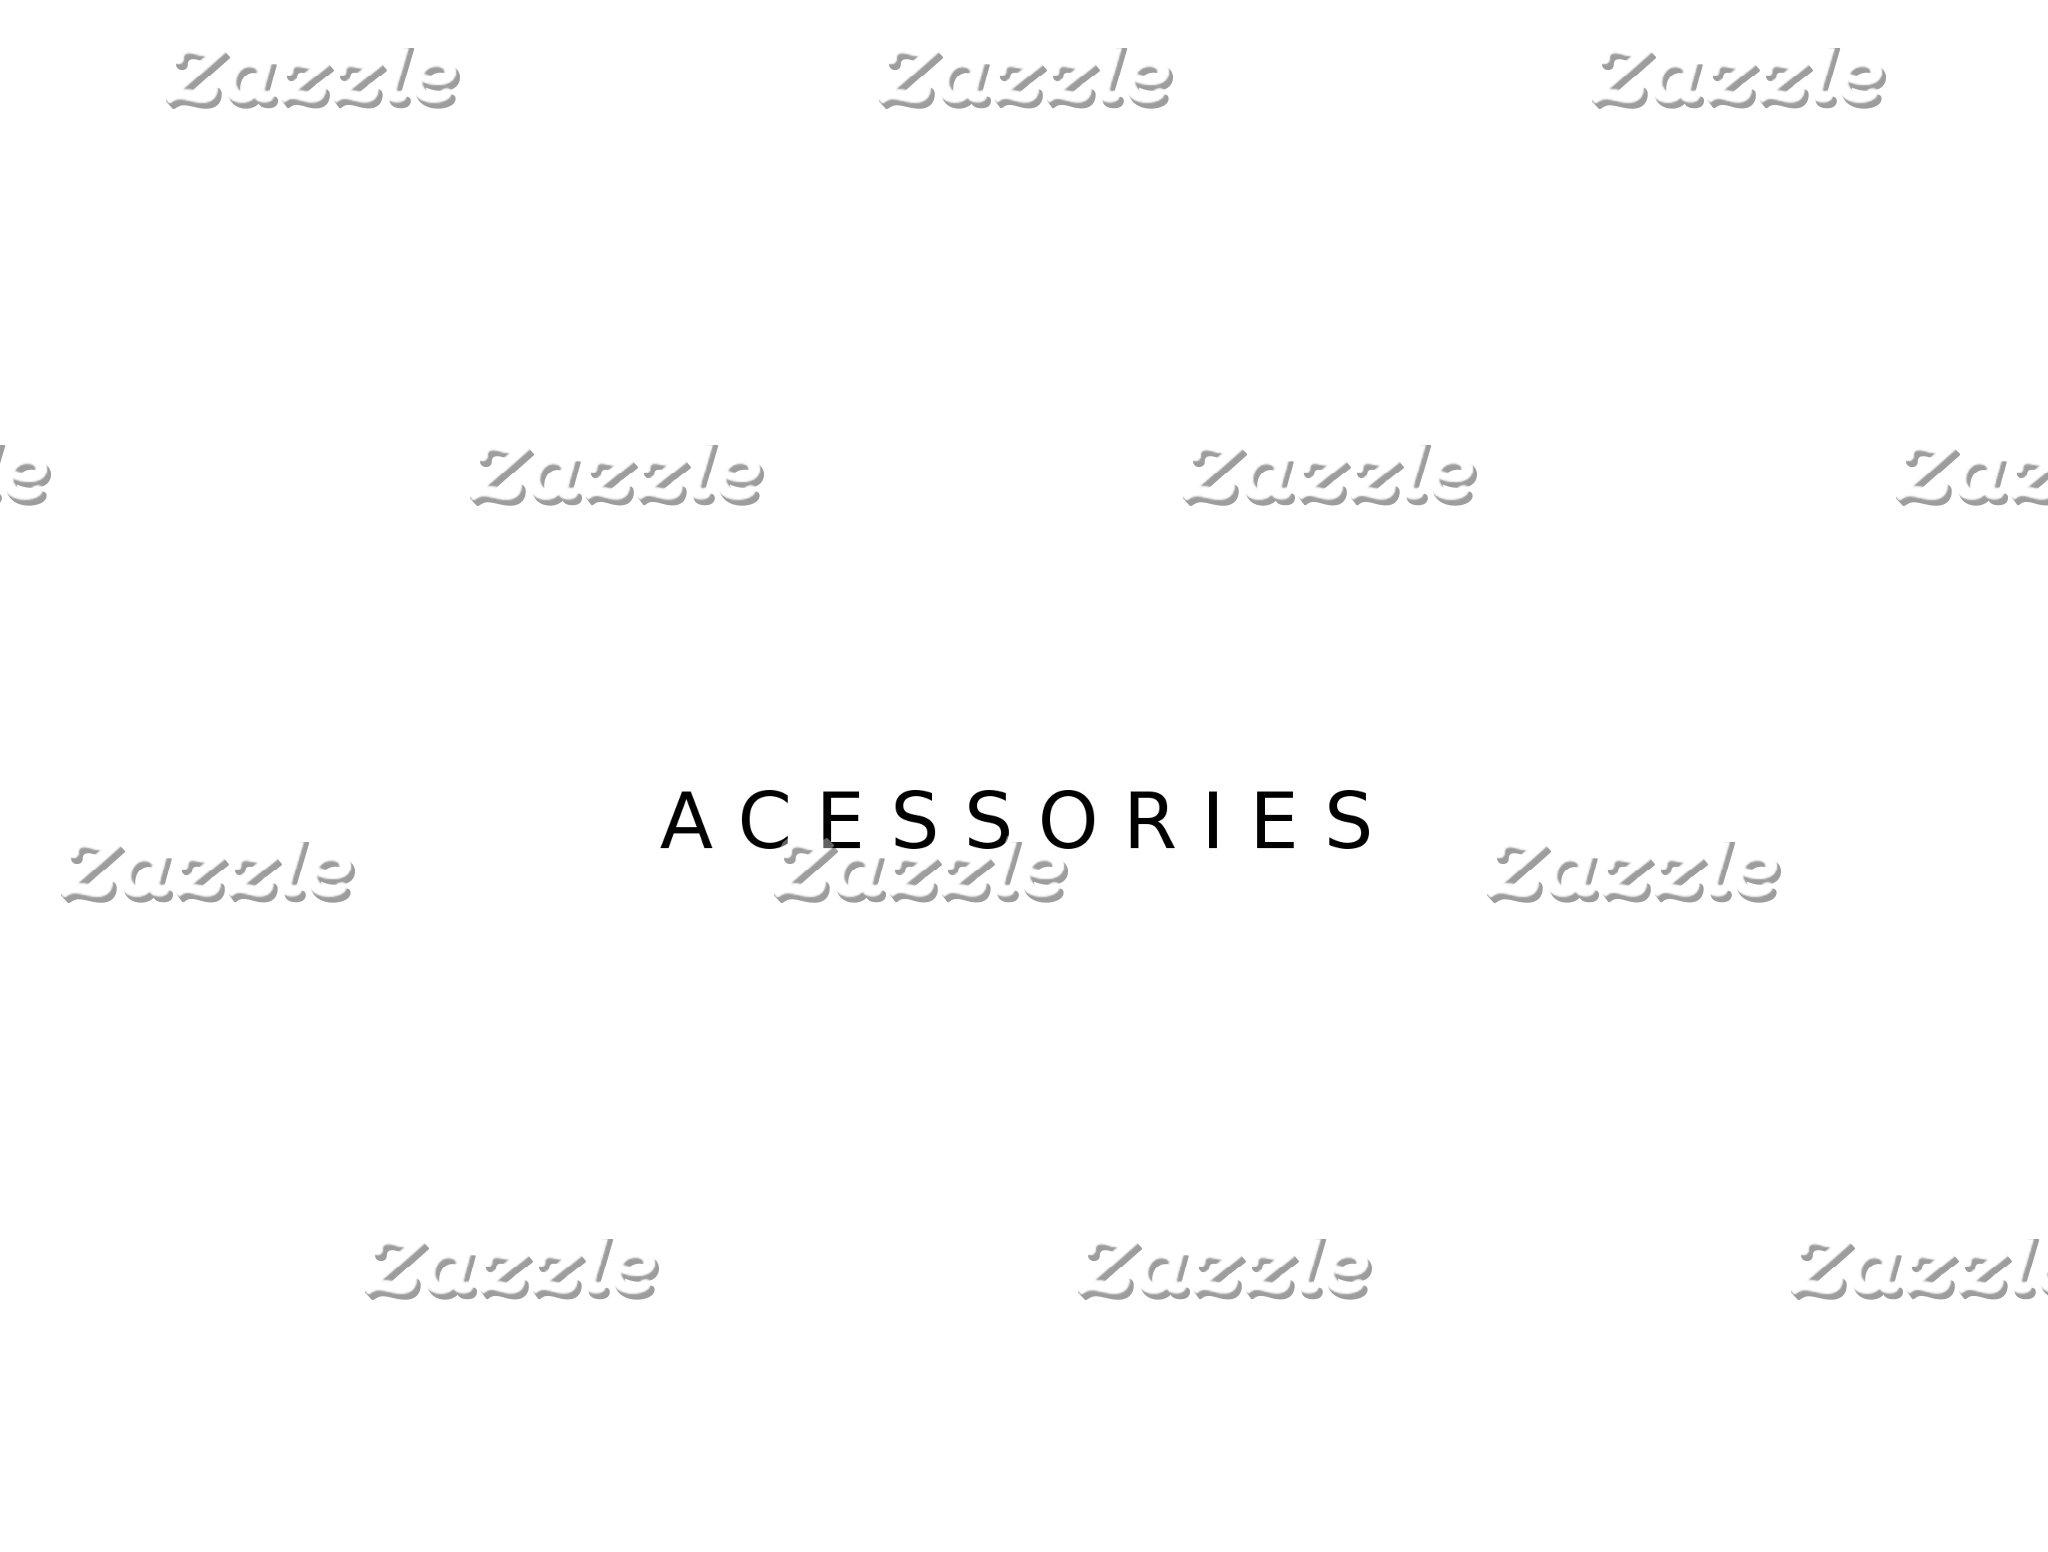 Acessories